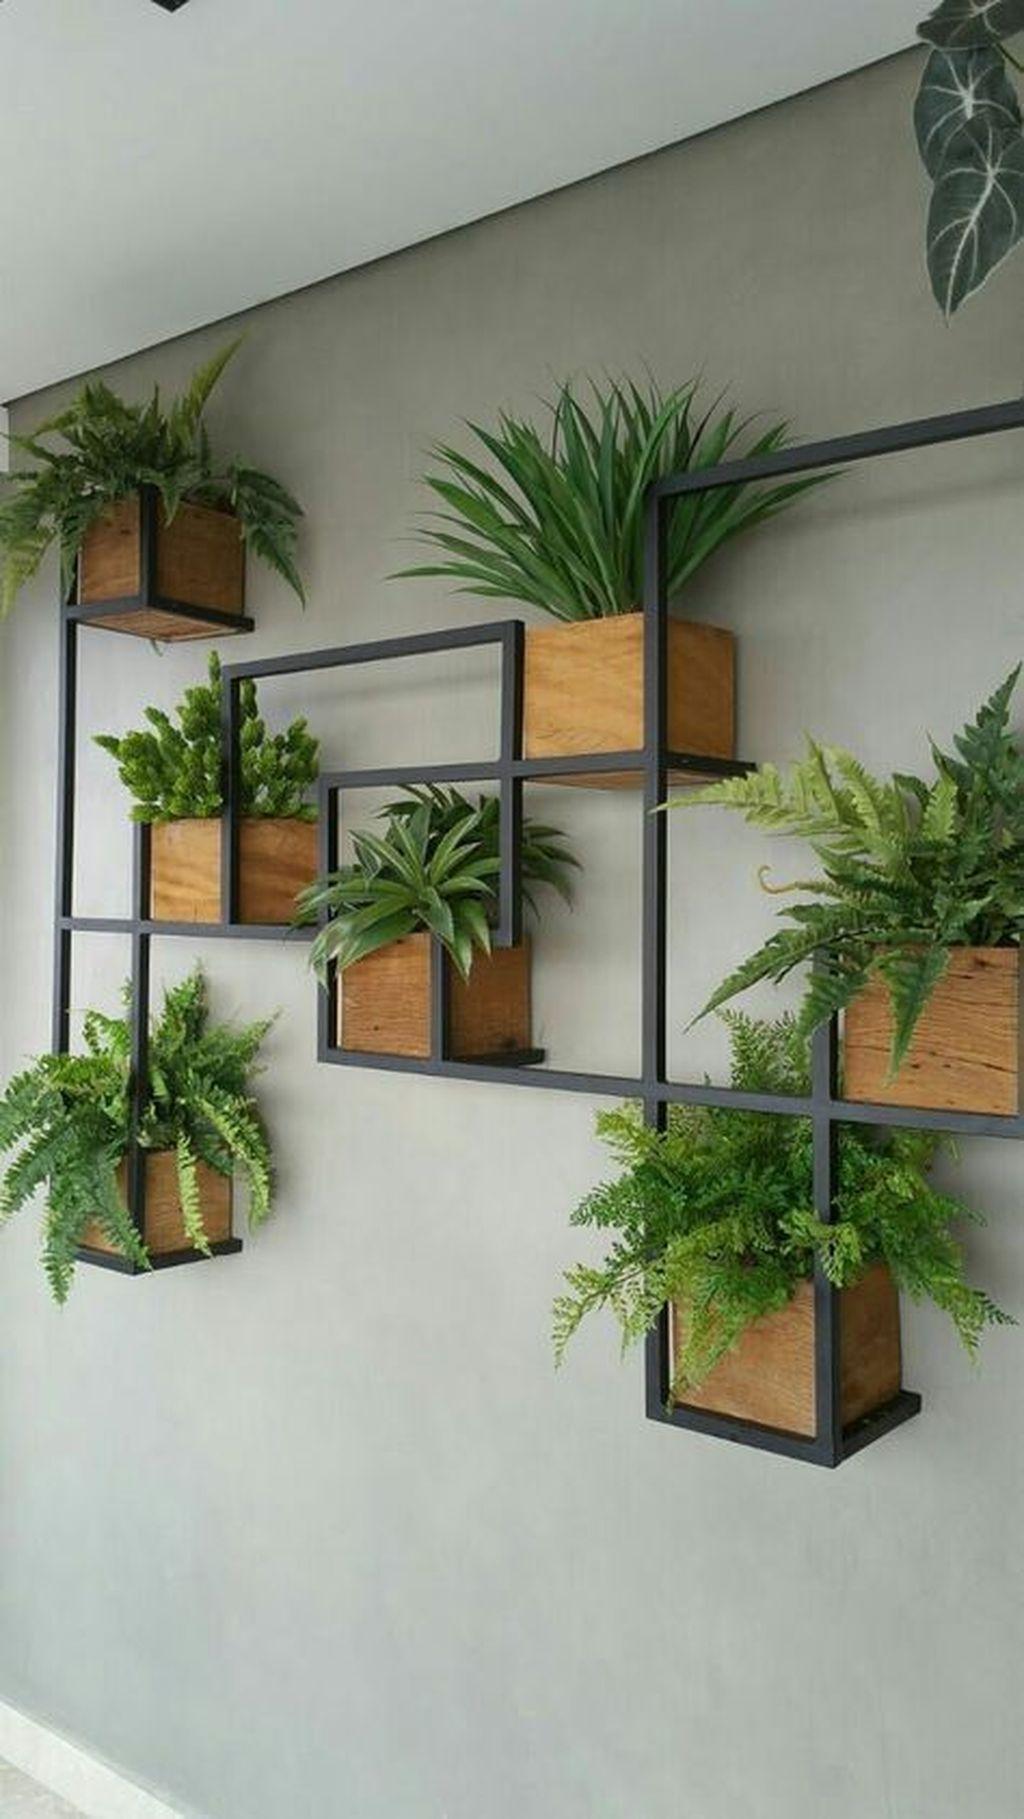 Popular Vertical Garden Wall For Outdoors Decor 11